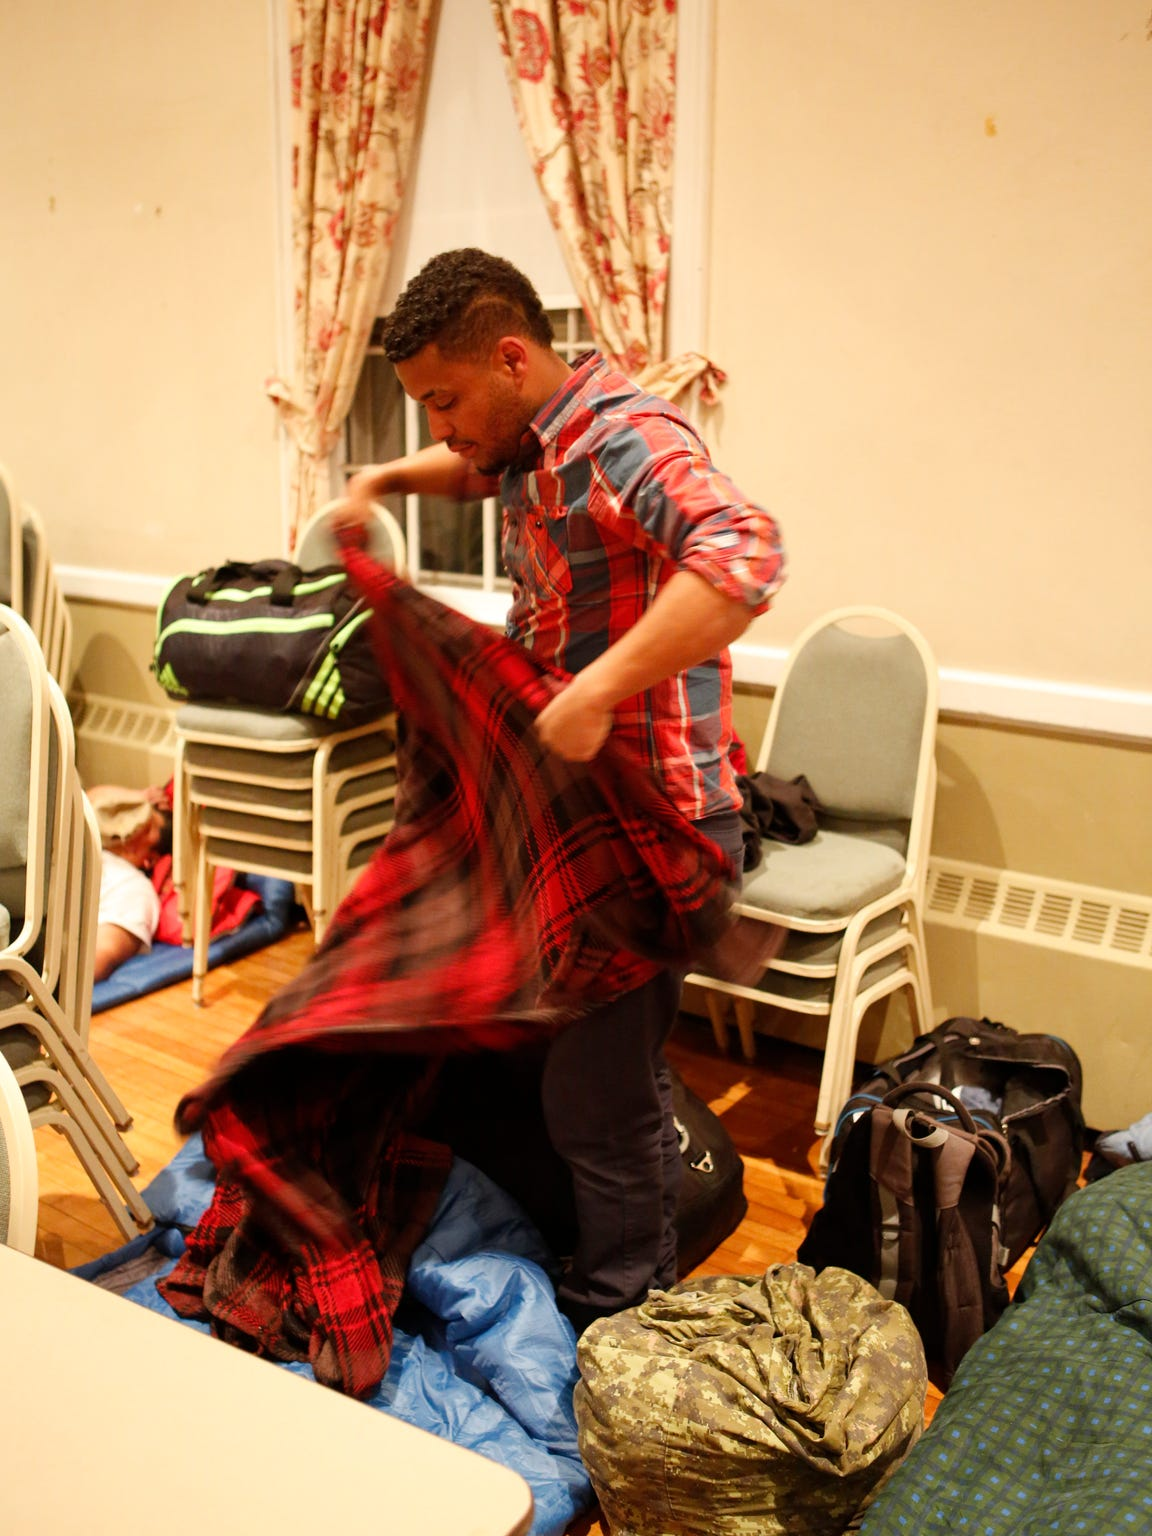 John Joham, 31, has been living in the temporary winter